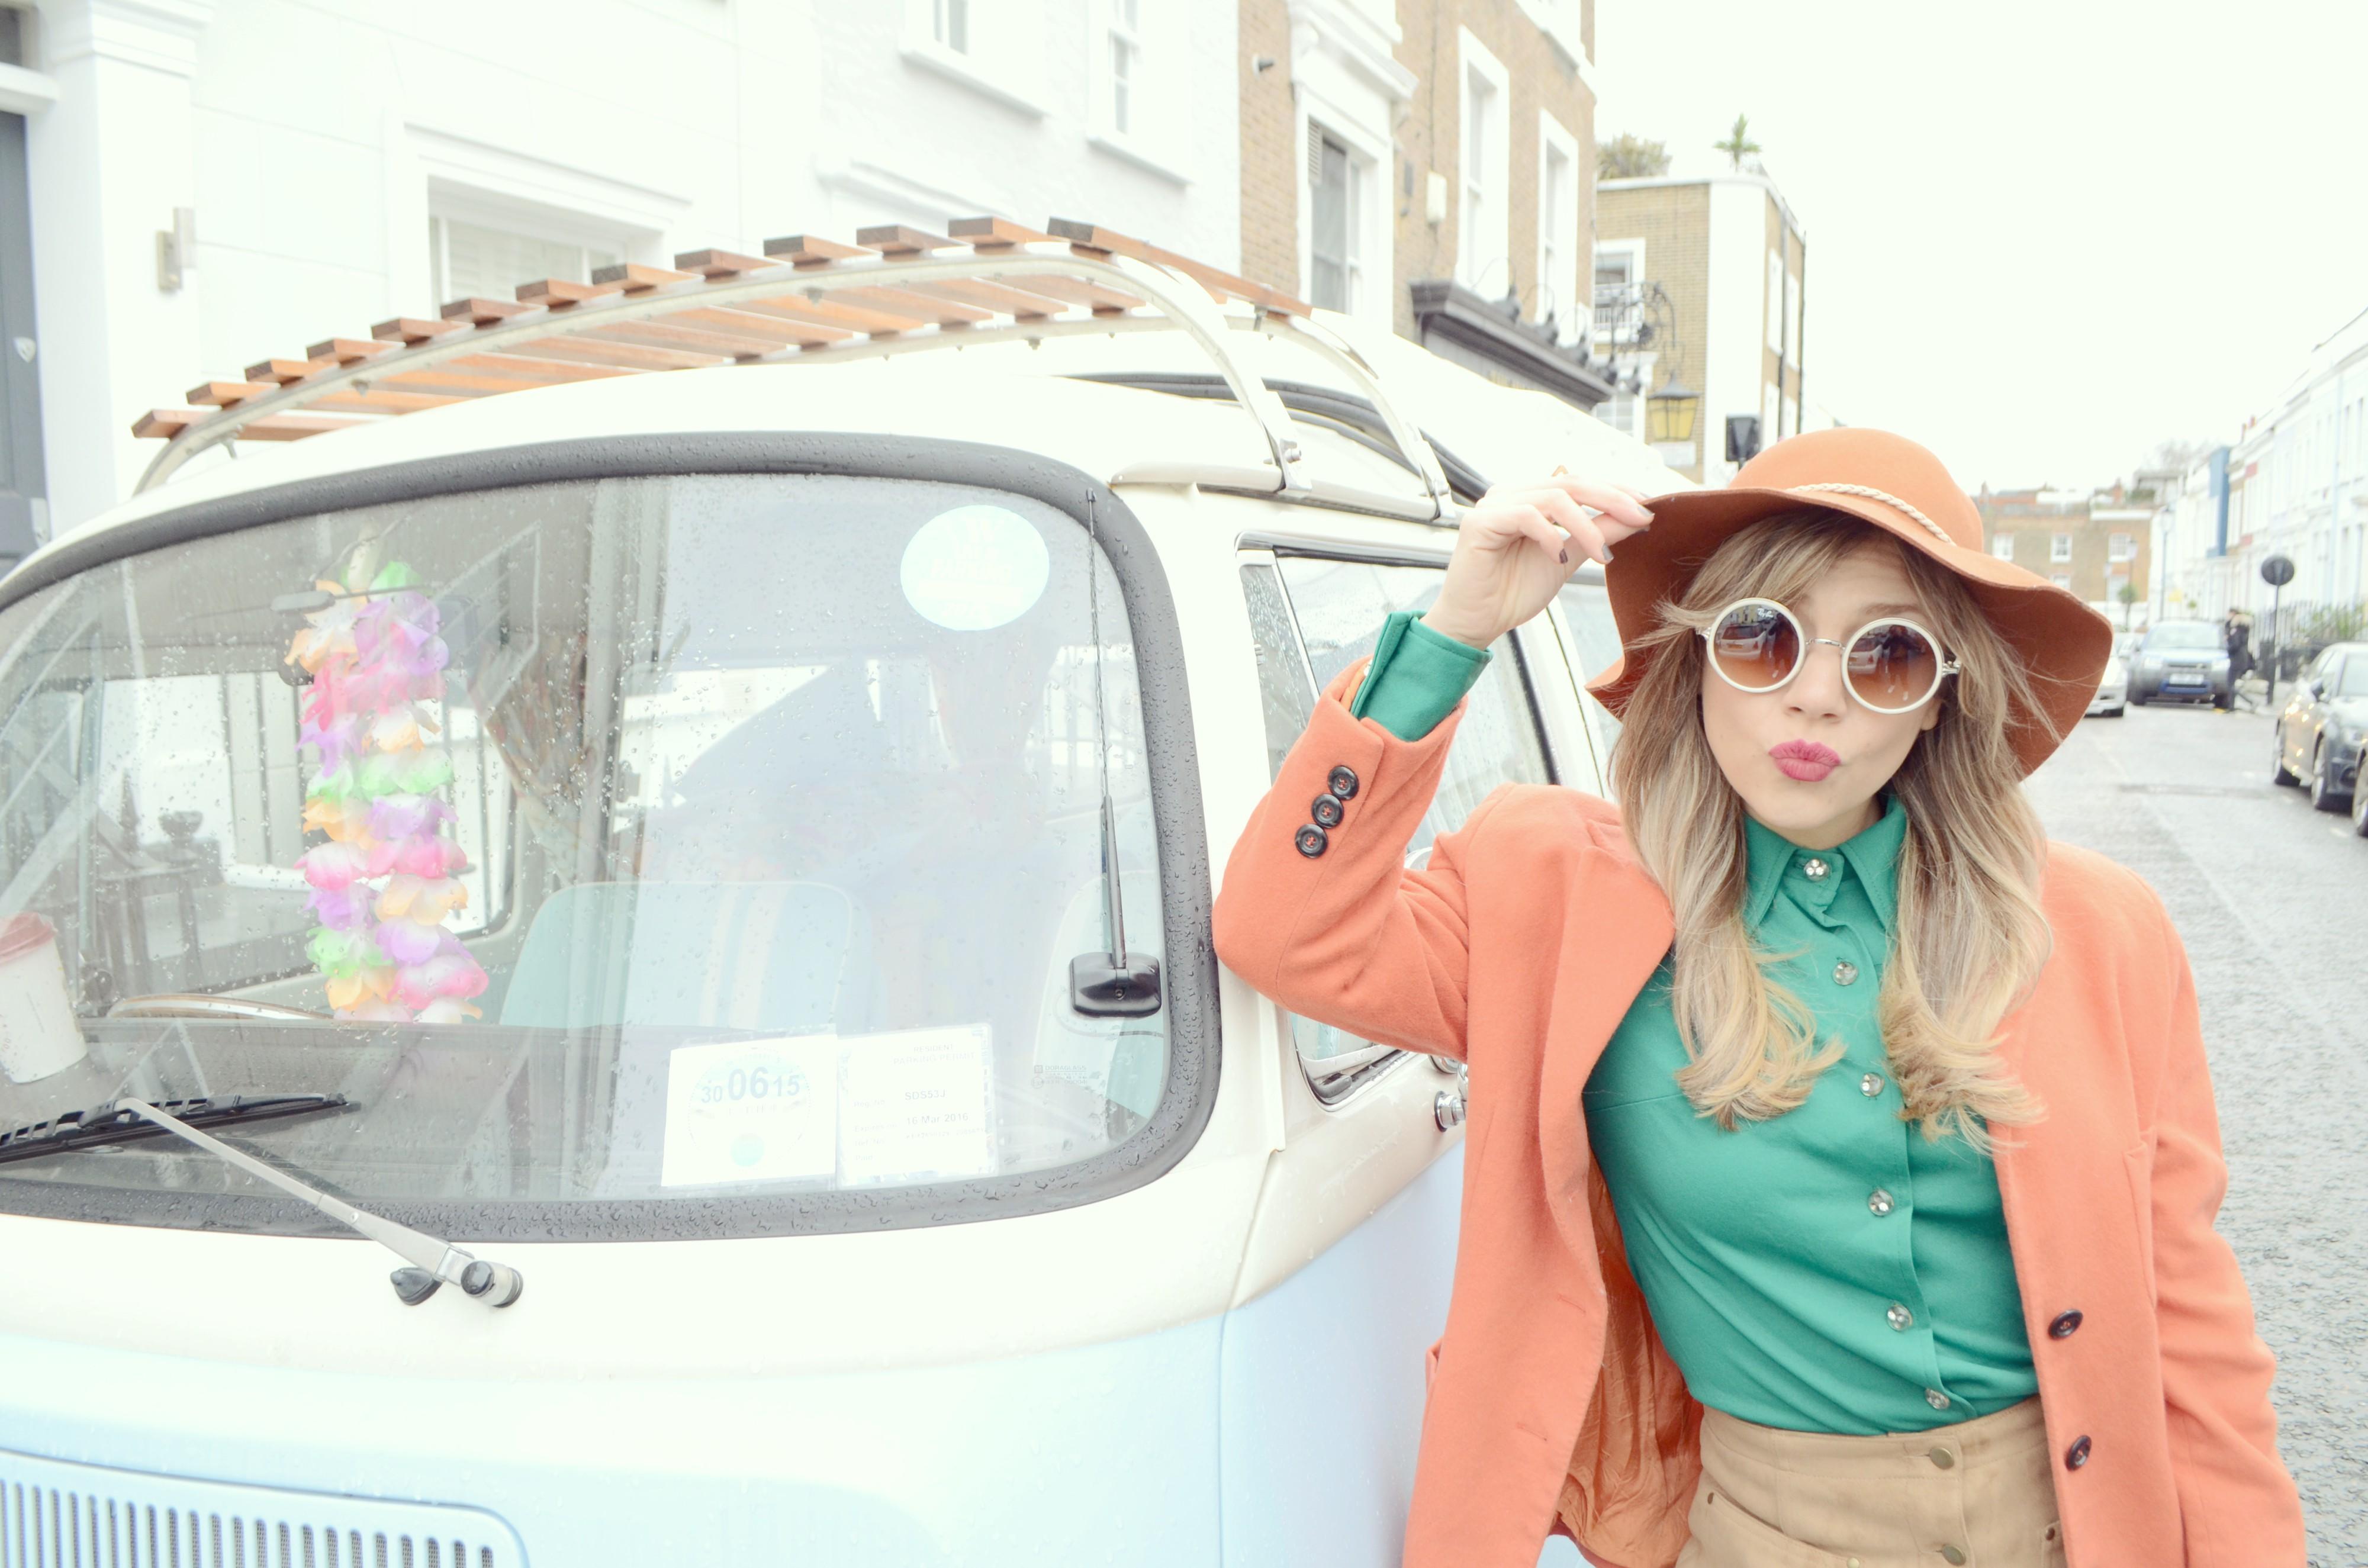 ChicAdicta-Blog-de-moda-Chic-Adicta-fashionista-Vintage-look-orange-outfit-Notting-Hill-street-style-beautiful-bloggers-PiensaenChic-Piensa-en-Chic